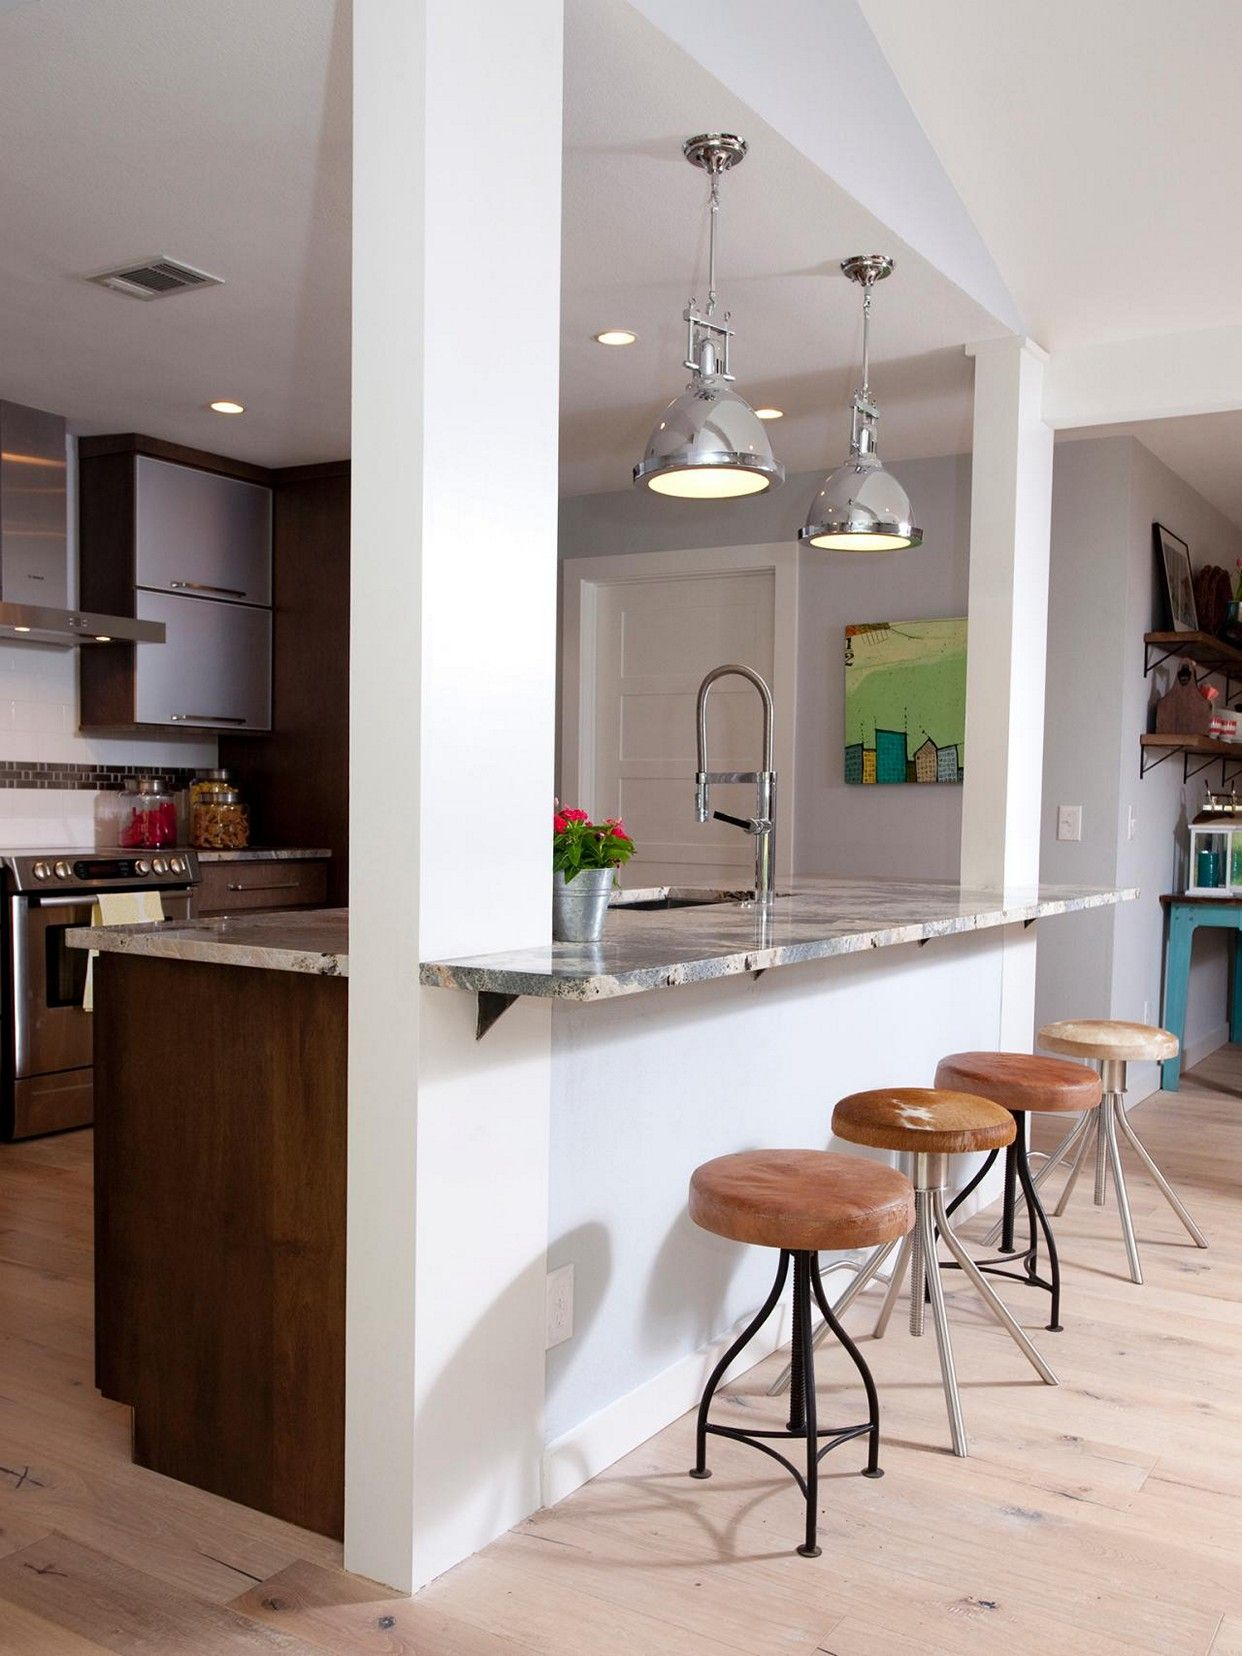 Open kitchen ideas open concept kitchen with half wall ideas GUYTQUT